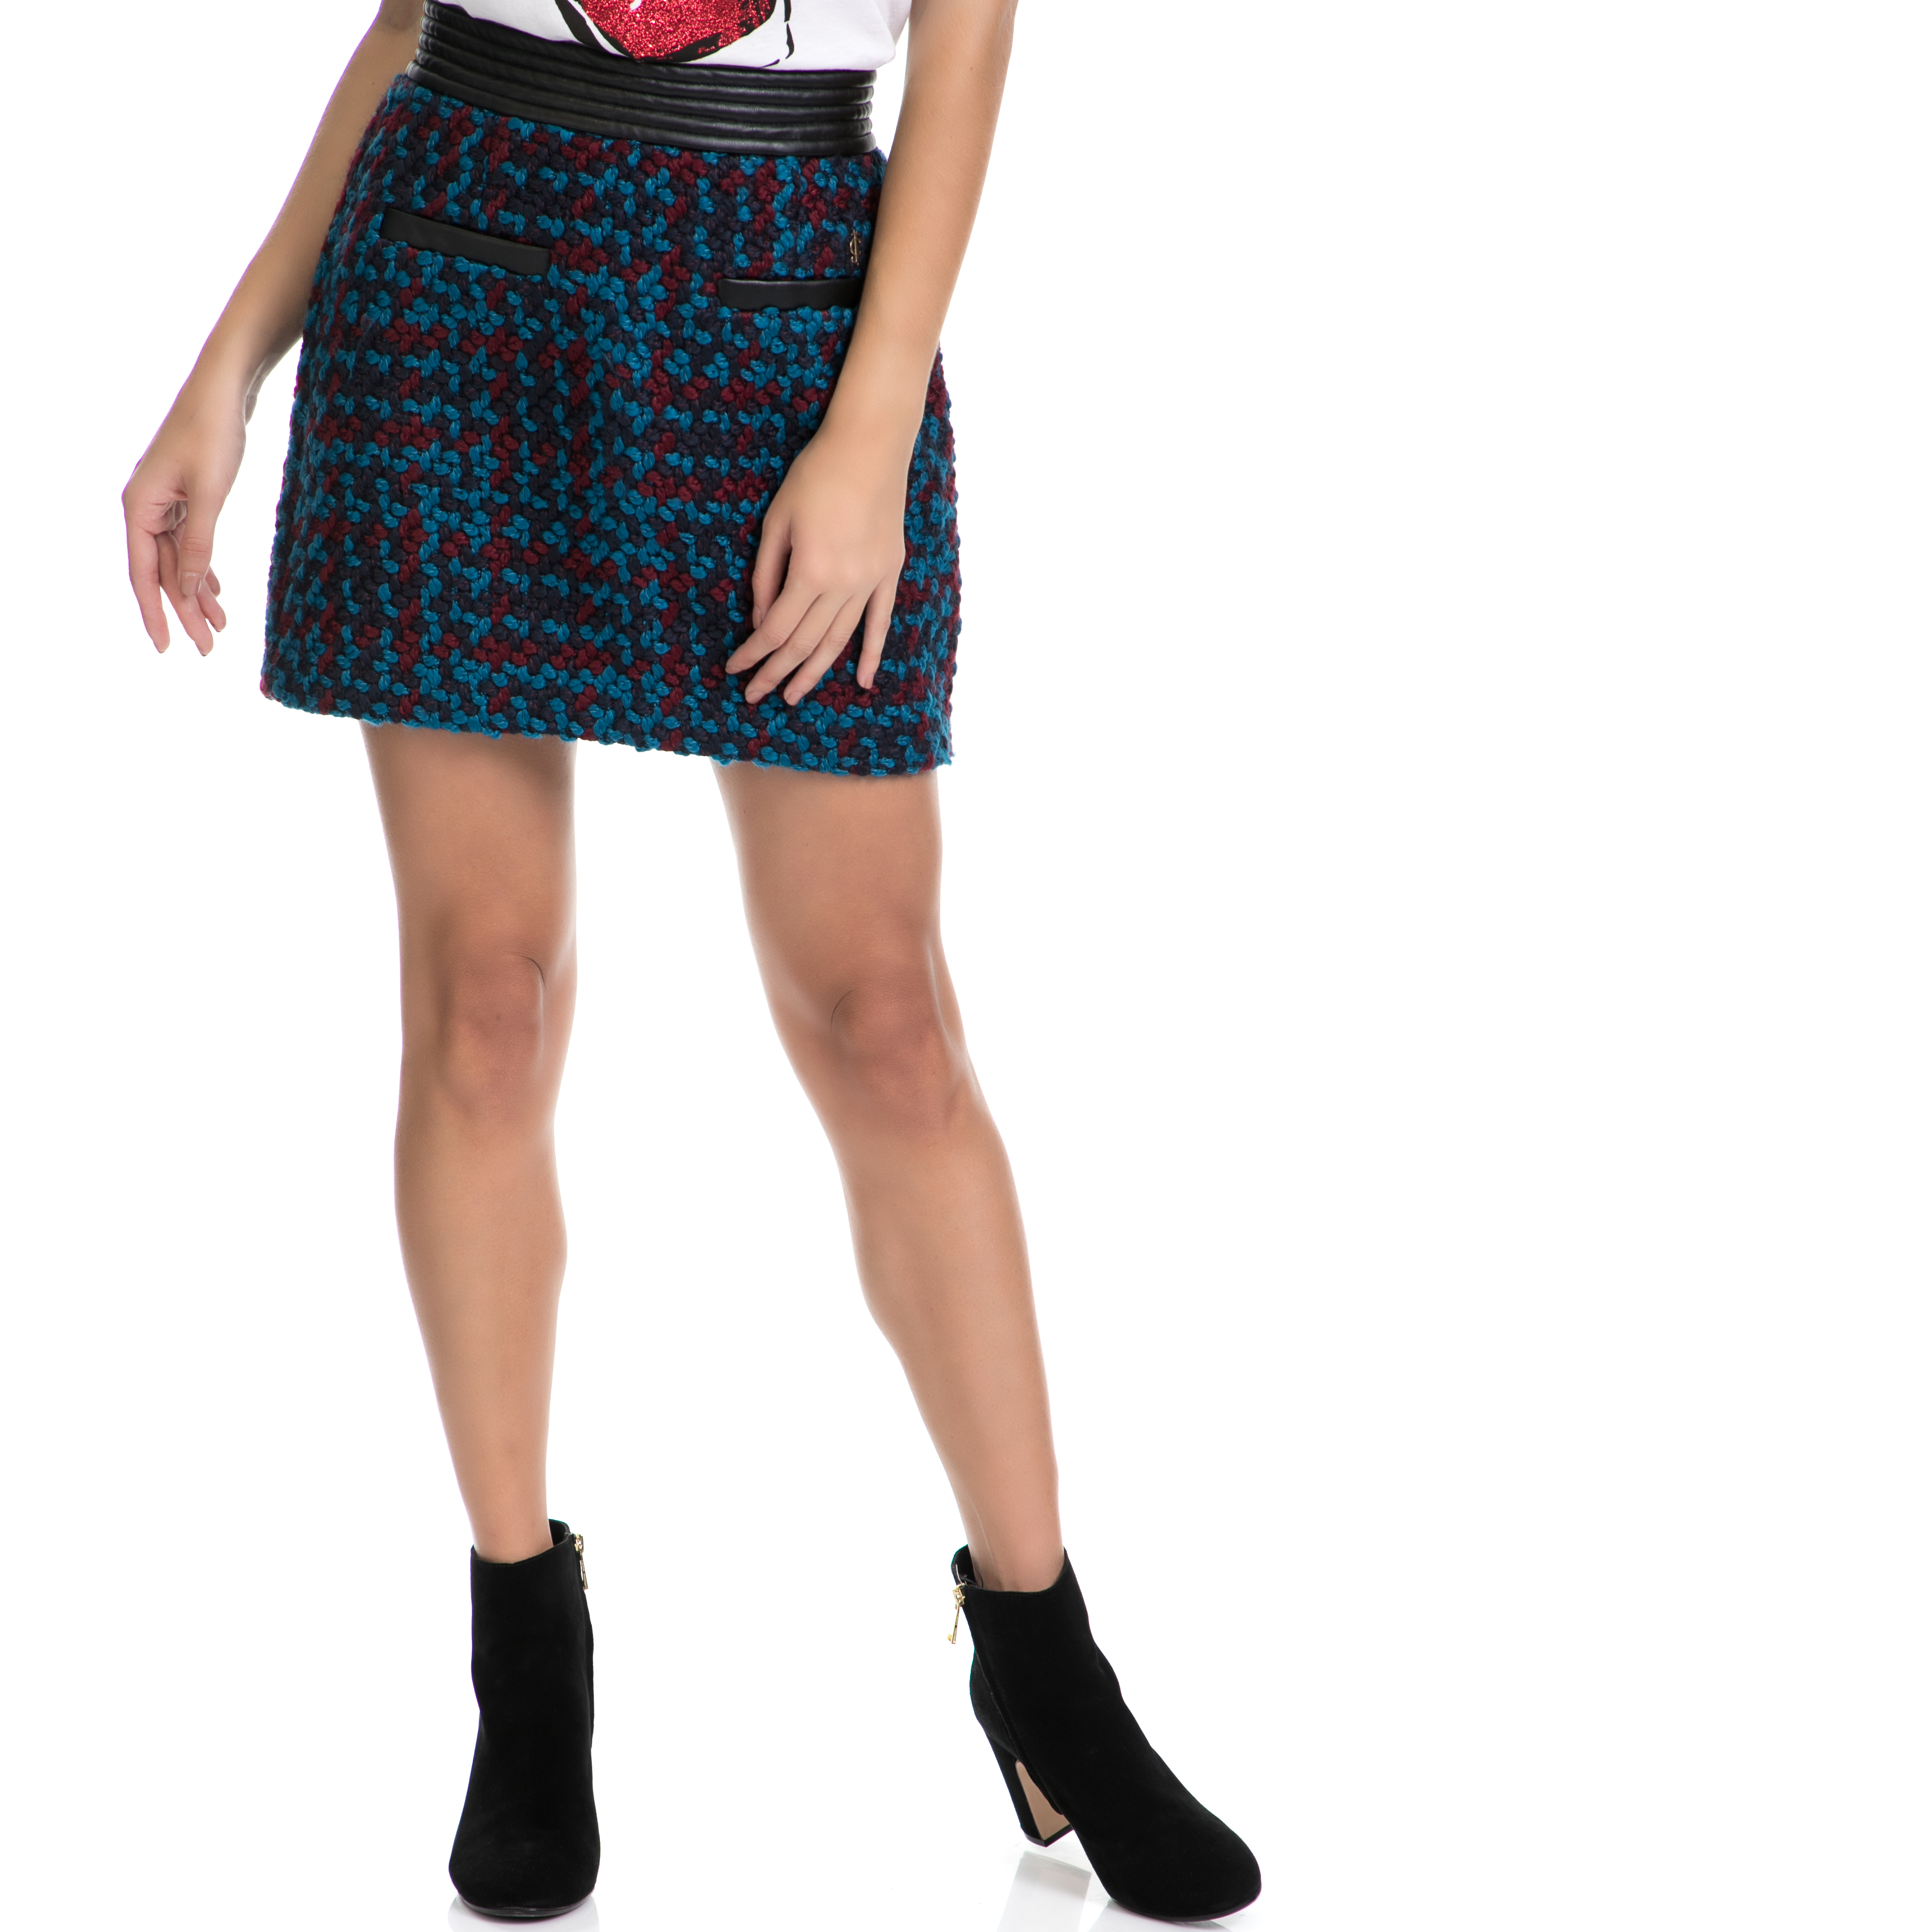 JUICY COUTURE - Γυναικεία φούστα HW CHUNKY TWEED SKIRT μπλε